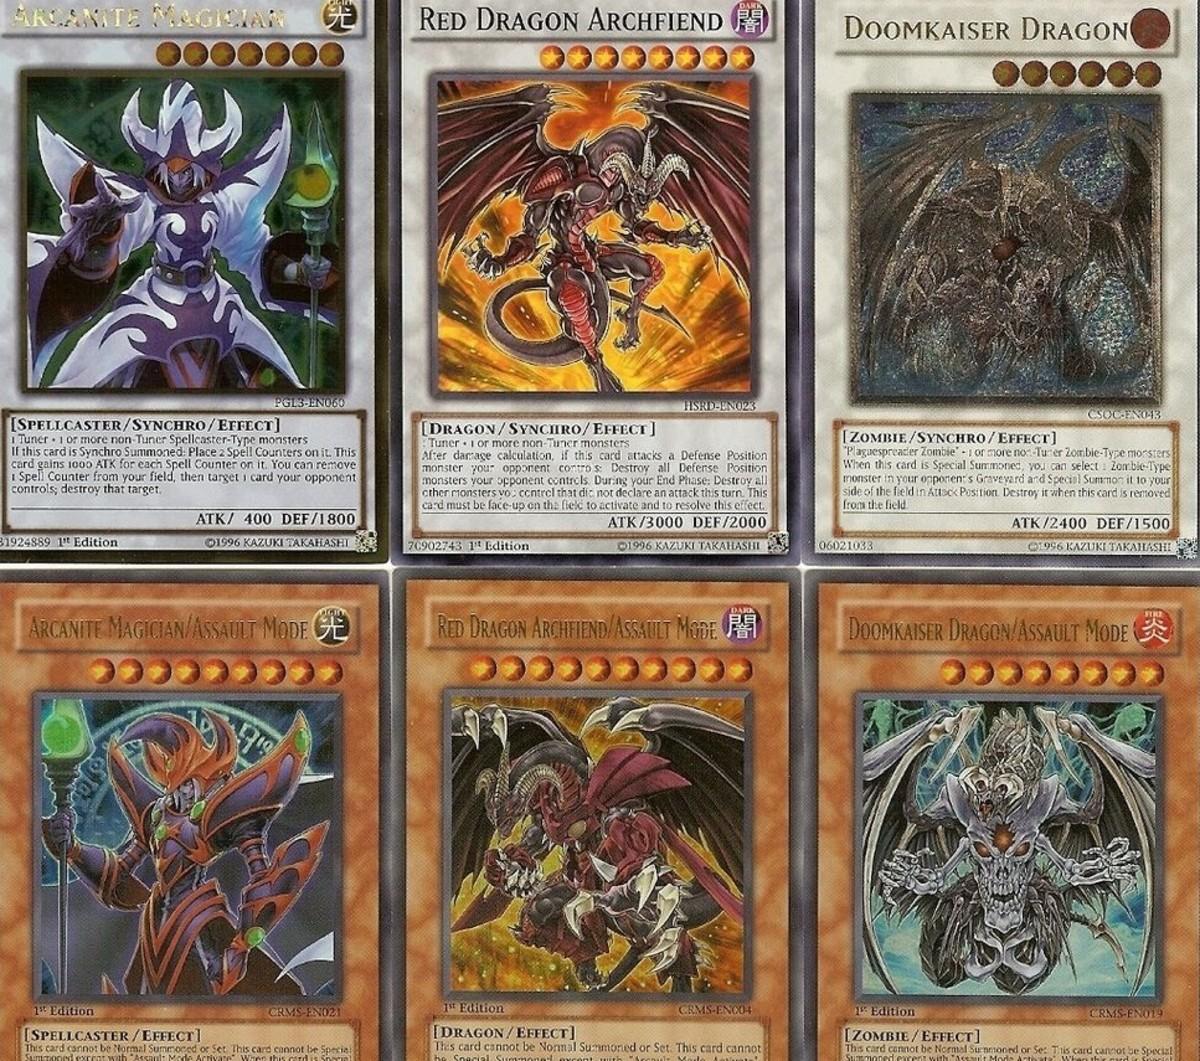 Assault Mode monsters in yugioh